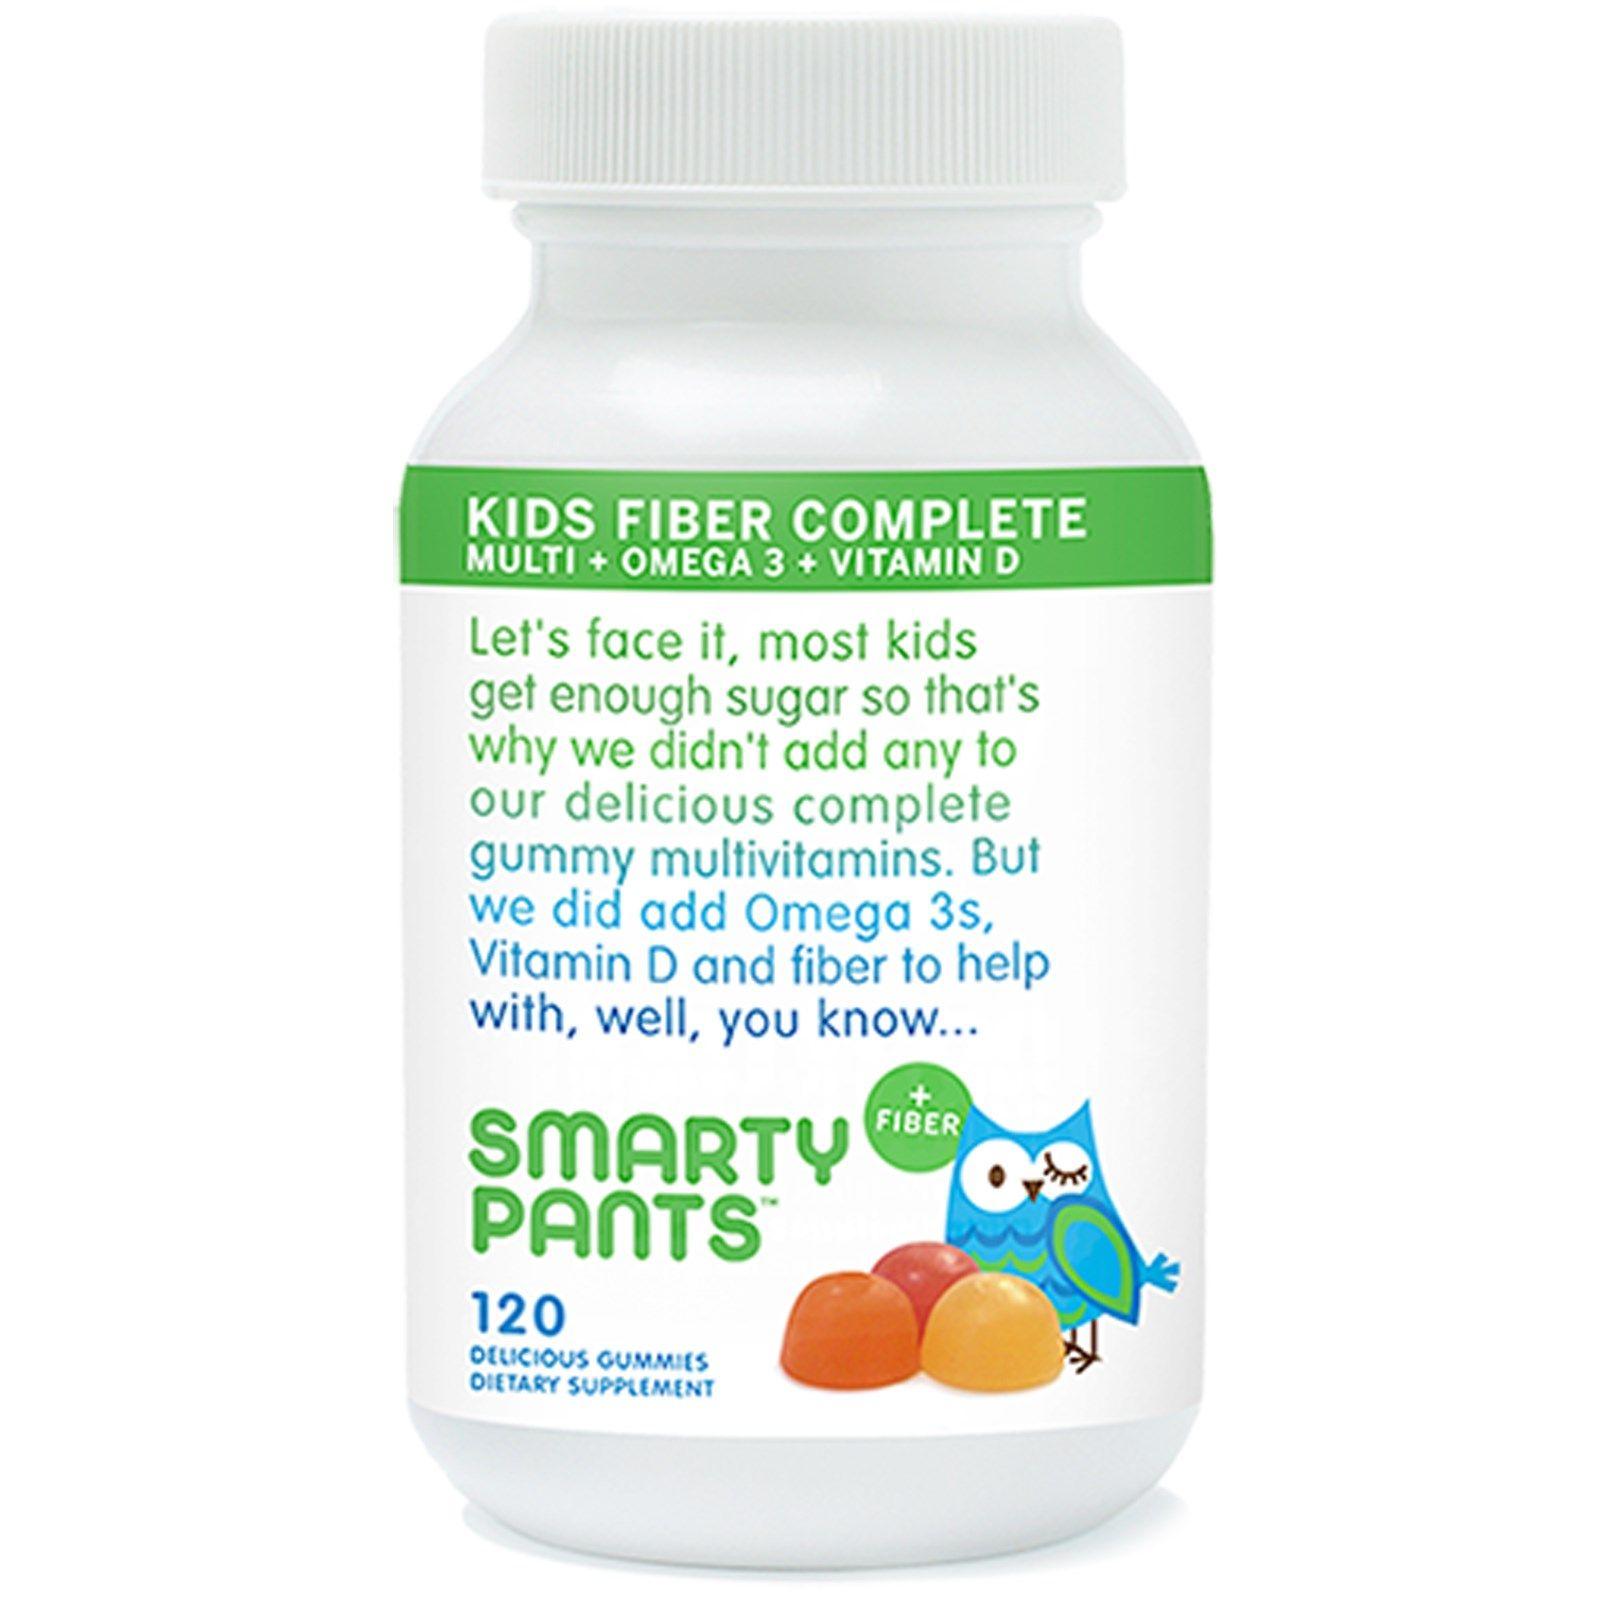 Smartypants Kids Complete Fiber Multi Omega 3 Vitamin D 120 Delicious Gummies Vitamins For Kids Gummy Vitamins Multivitamin